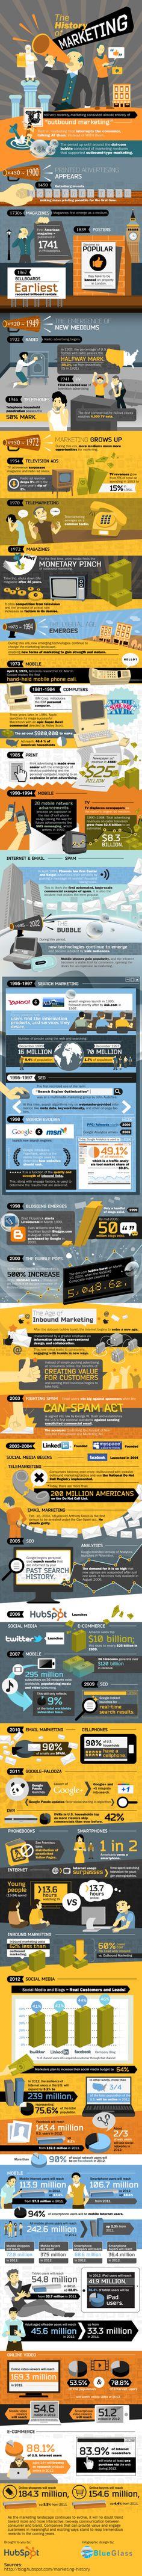 Ilustrowana historia marketingu 1450-2012